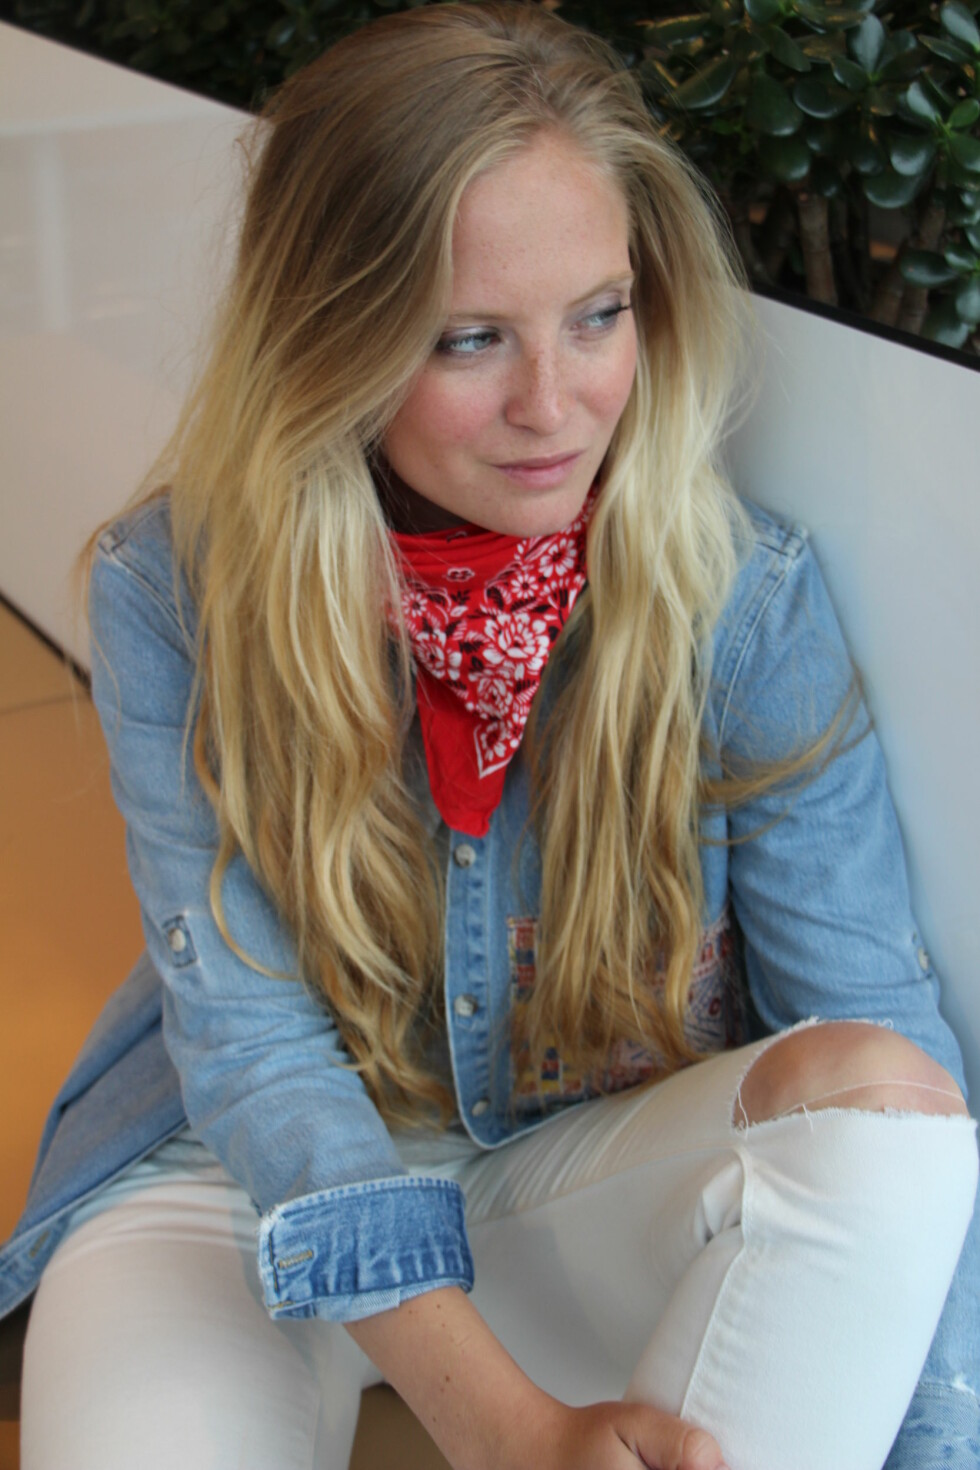 RUNDT HALSEN: Slik bruker Nathalie bandanaen rundt halsen. Foto: Malin Gaden